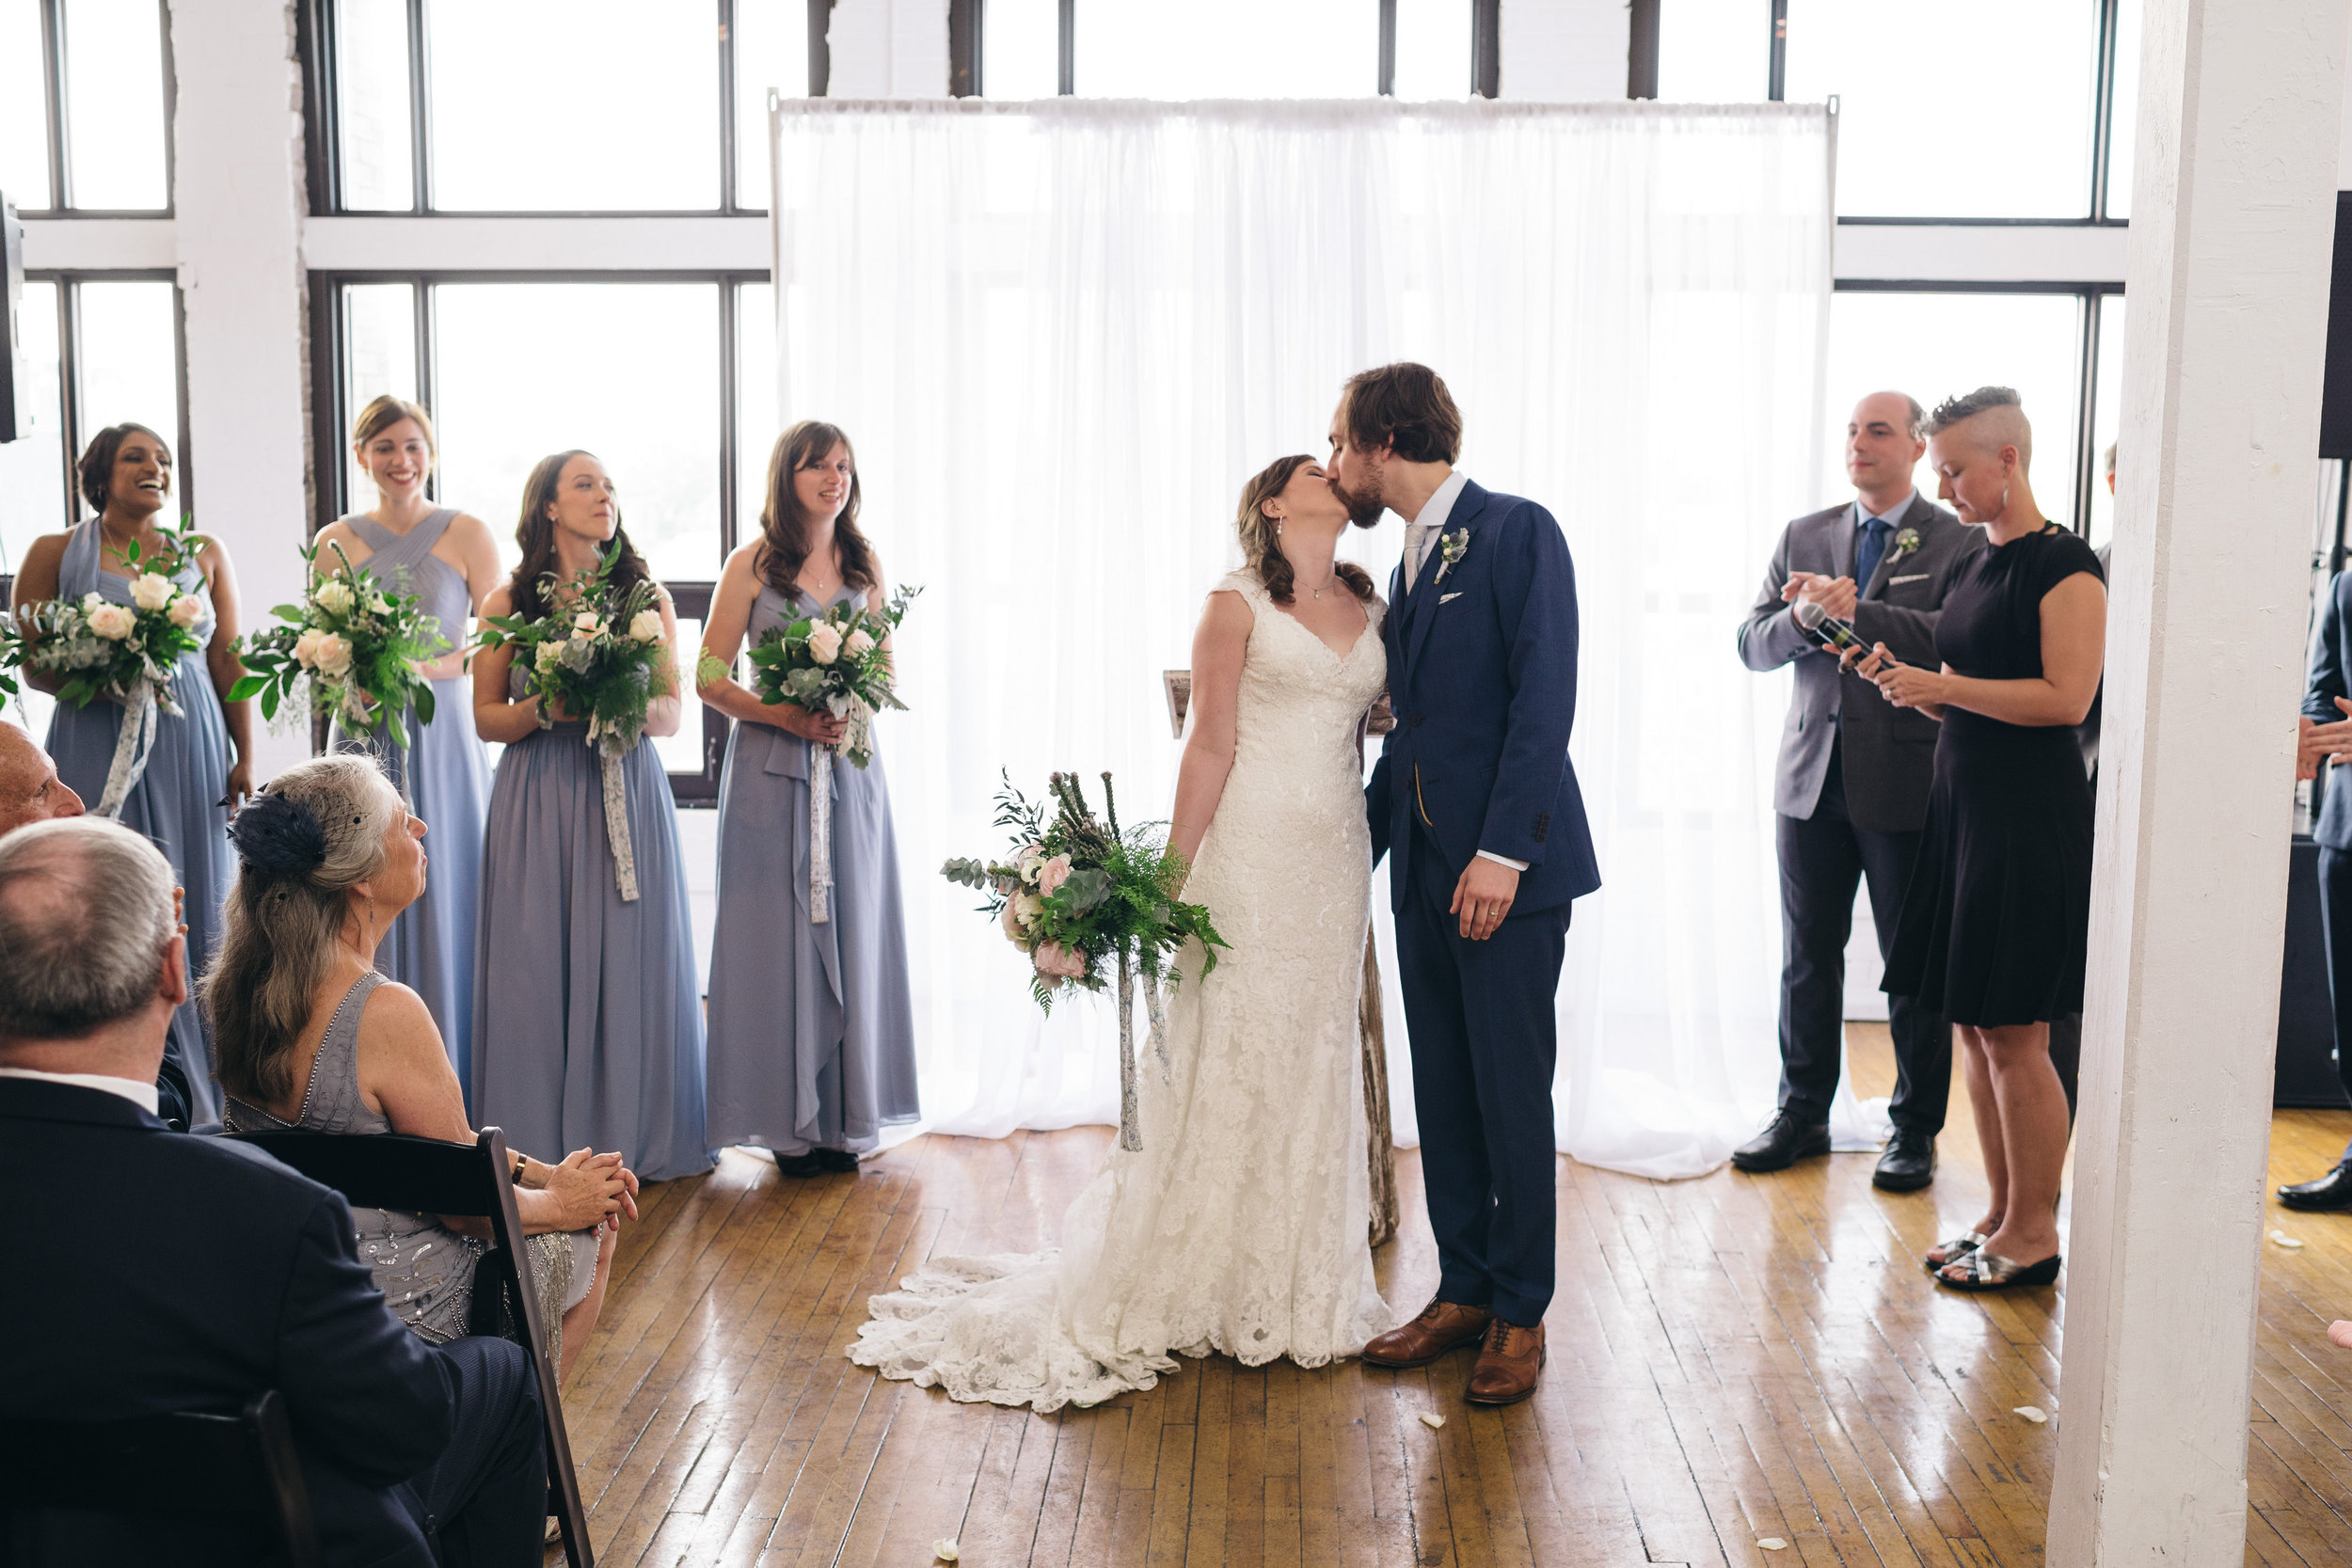 The Burroughes Building , Toronto Photo Credit: Toronto Wedding Studios